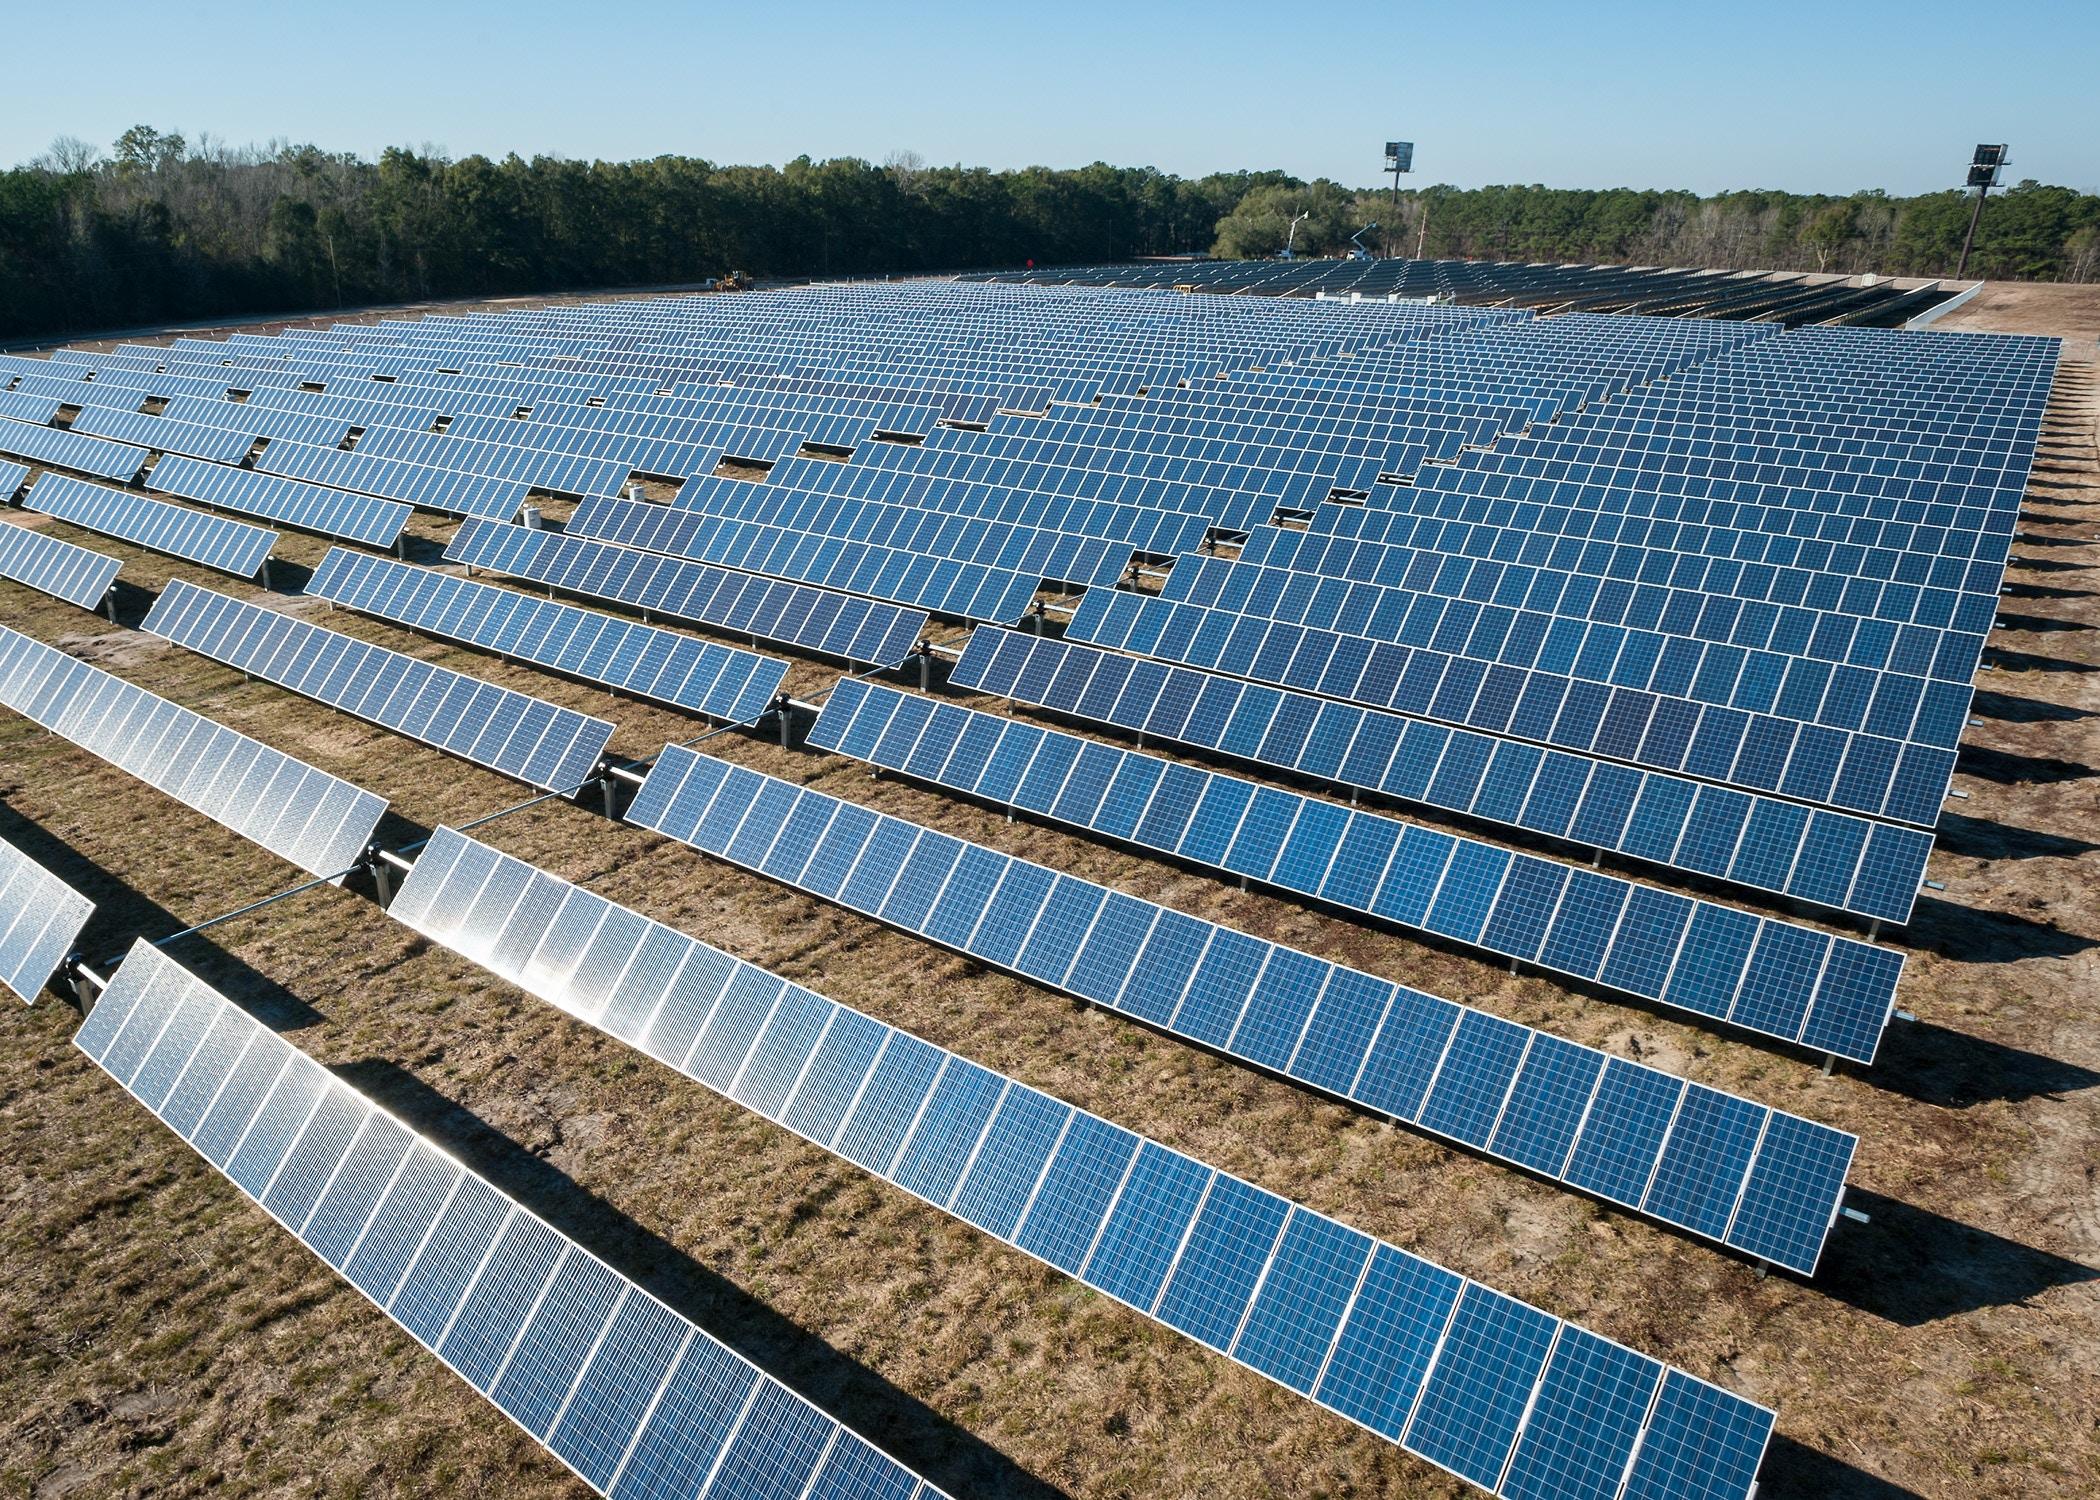 Photo by American Public Power Association